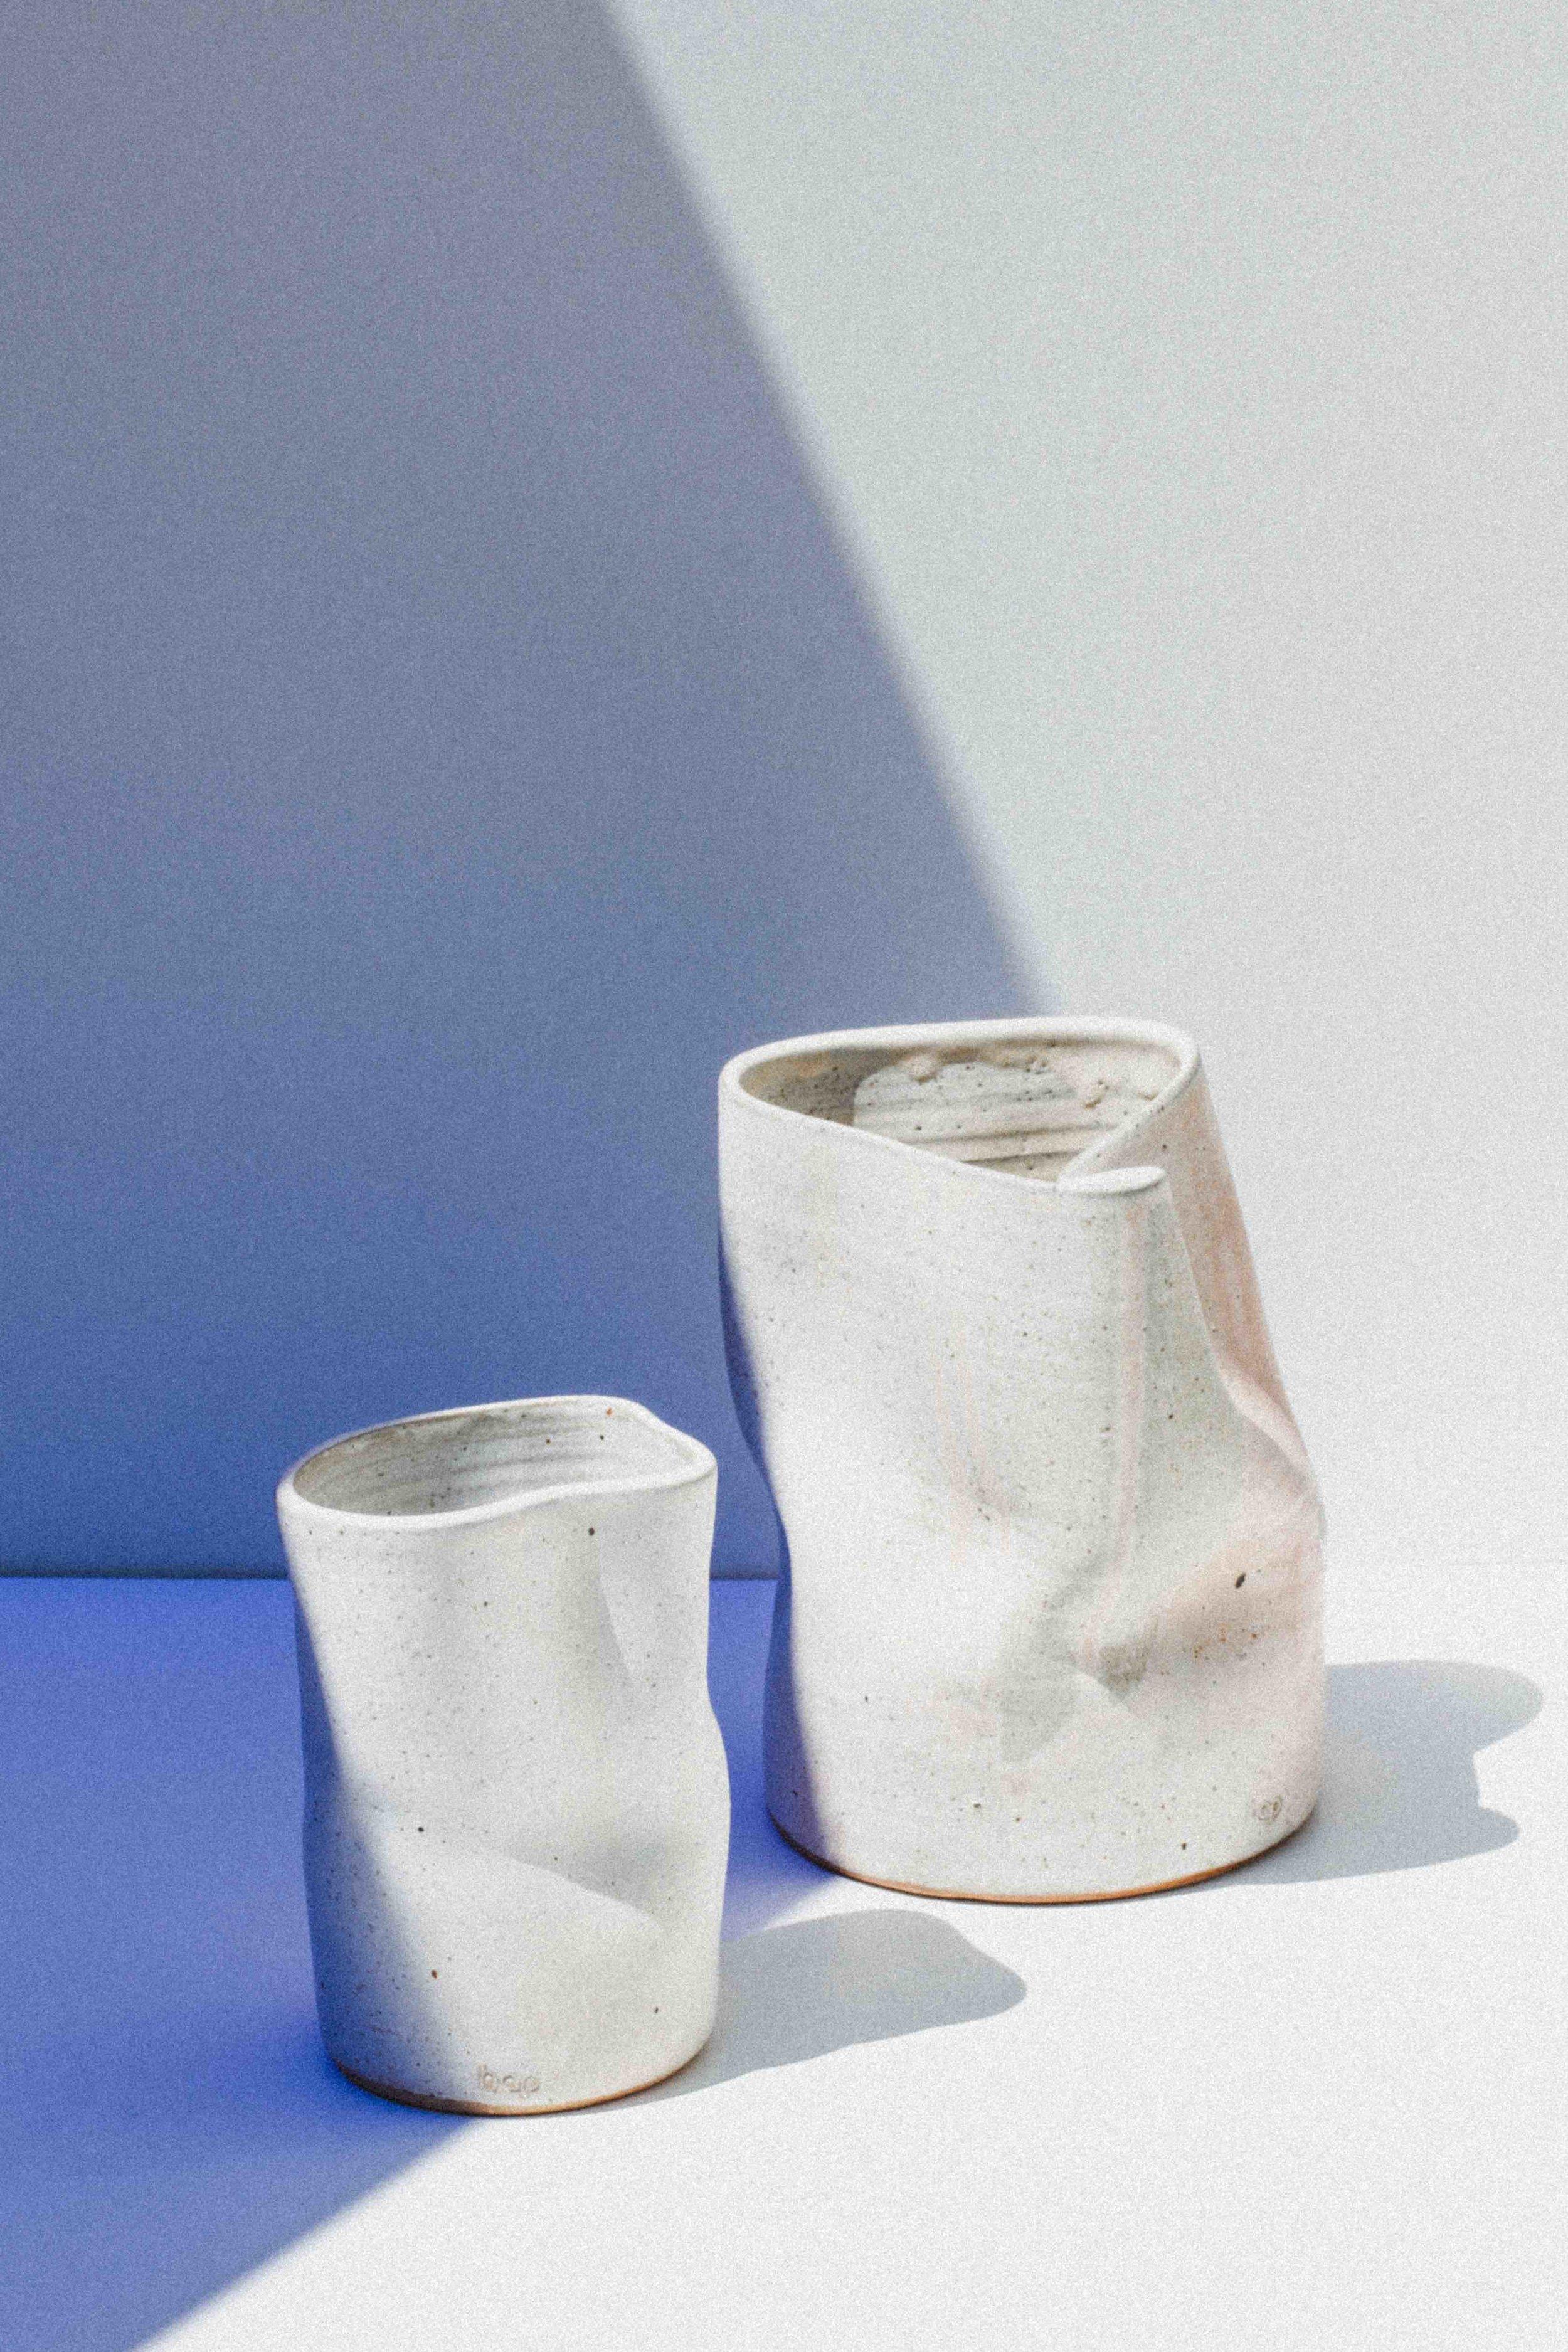 hap ceramics_Maxi Hoffmann_Düsseldorf_Keramik_Ceramics_Vase_Handgemacht_Interior_Design_Deformed.jpg